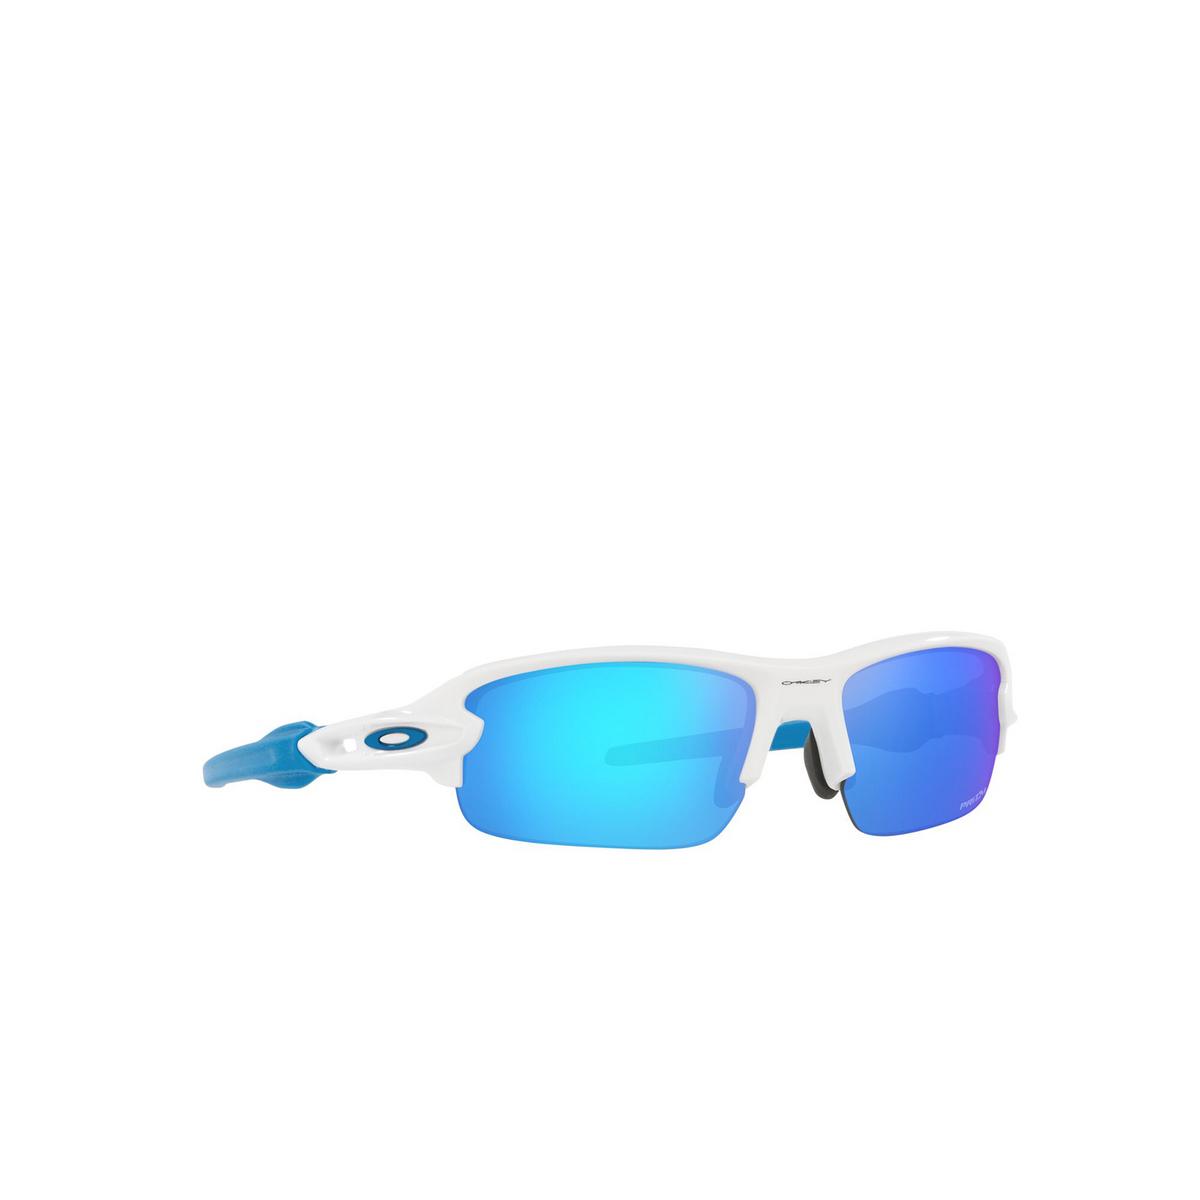 Oakley® Rectangle Sunglasses: Flak Xxs OJ9008 color Polished White 900806 - three-quarters view.